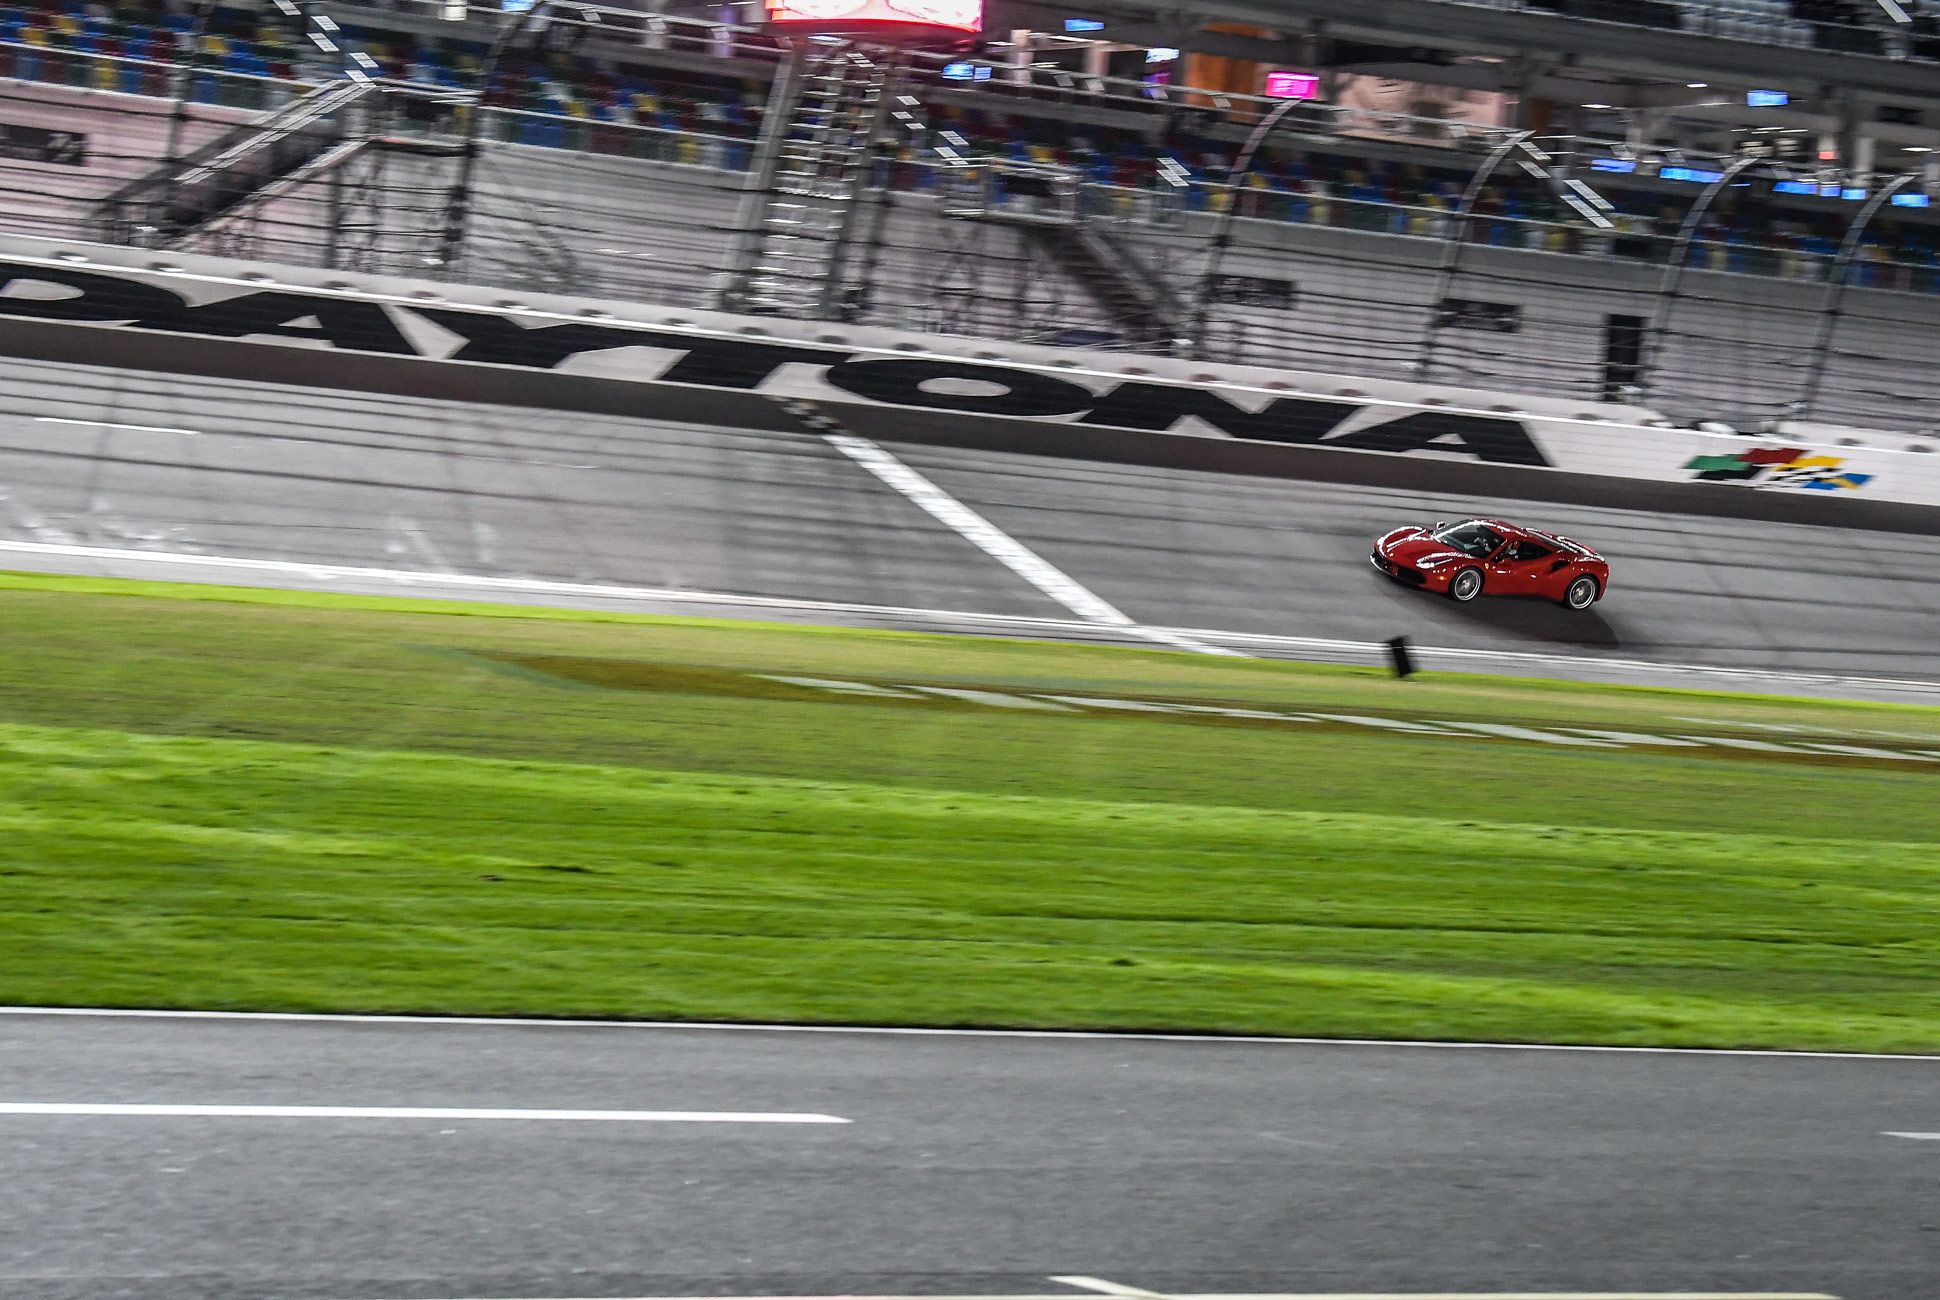 488-Daytona-Gear-Patrol-Slide-1